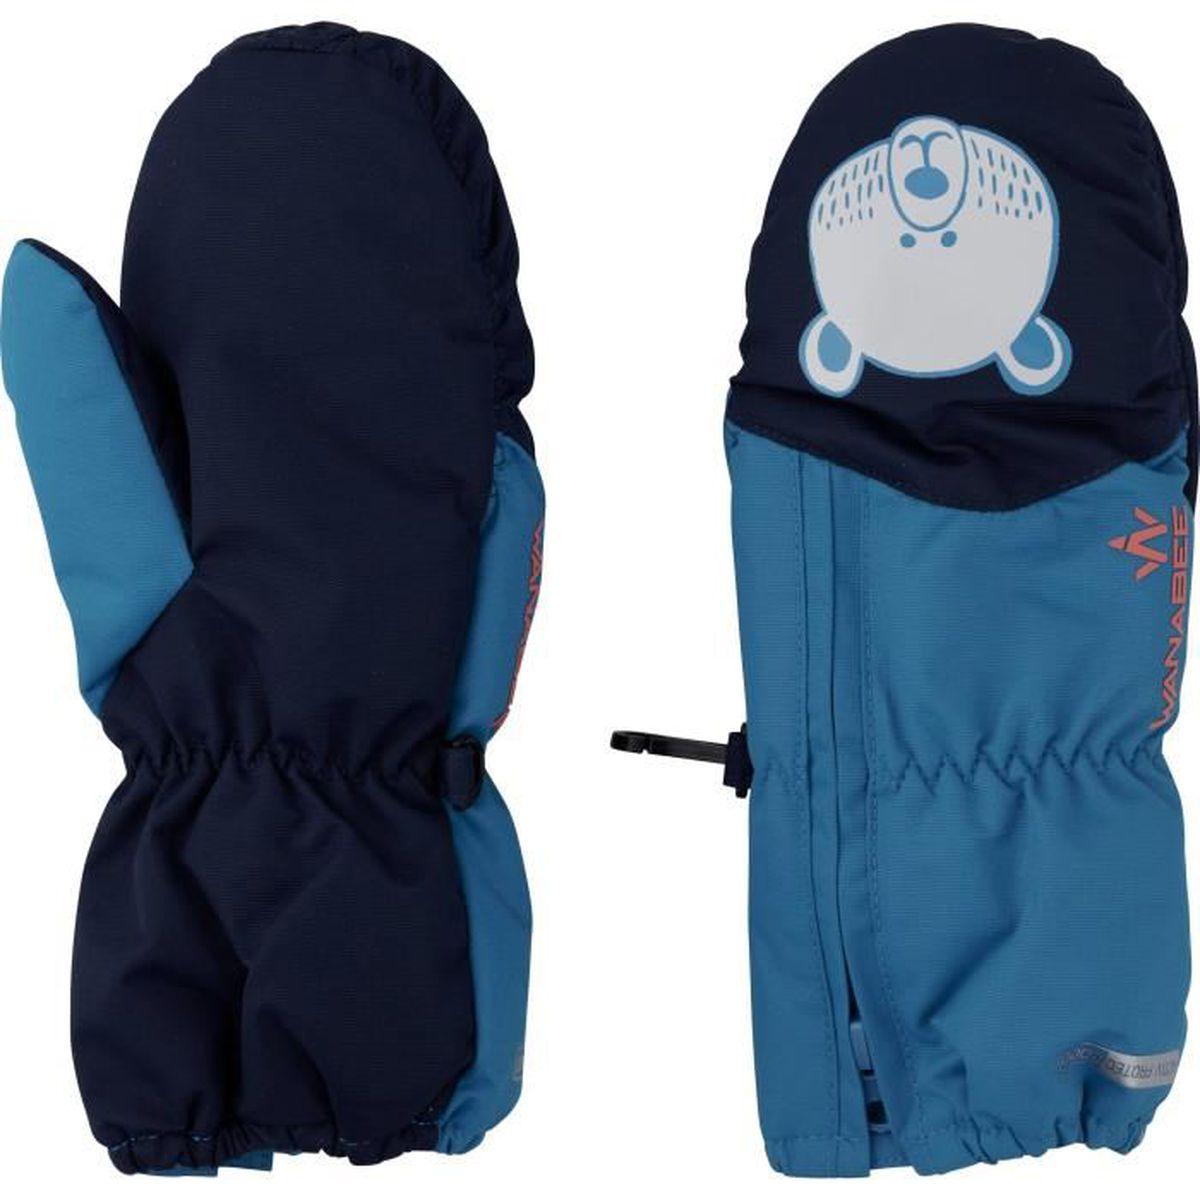 GANTS - MOUFLES DE SKI WANABEE Moufles de ski - Enfant garçon - Bleu